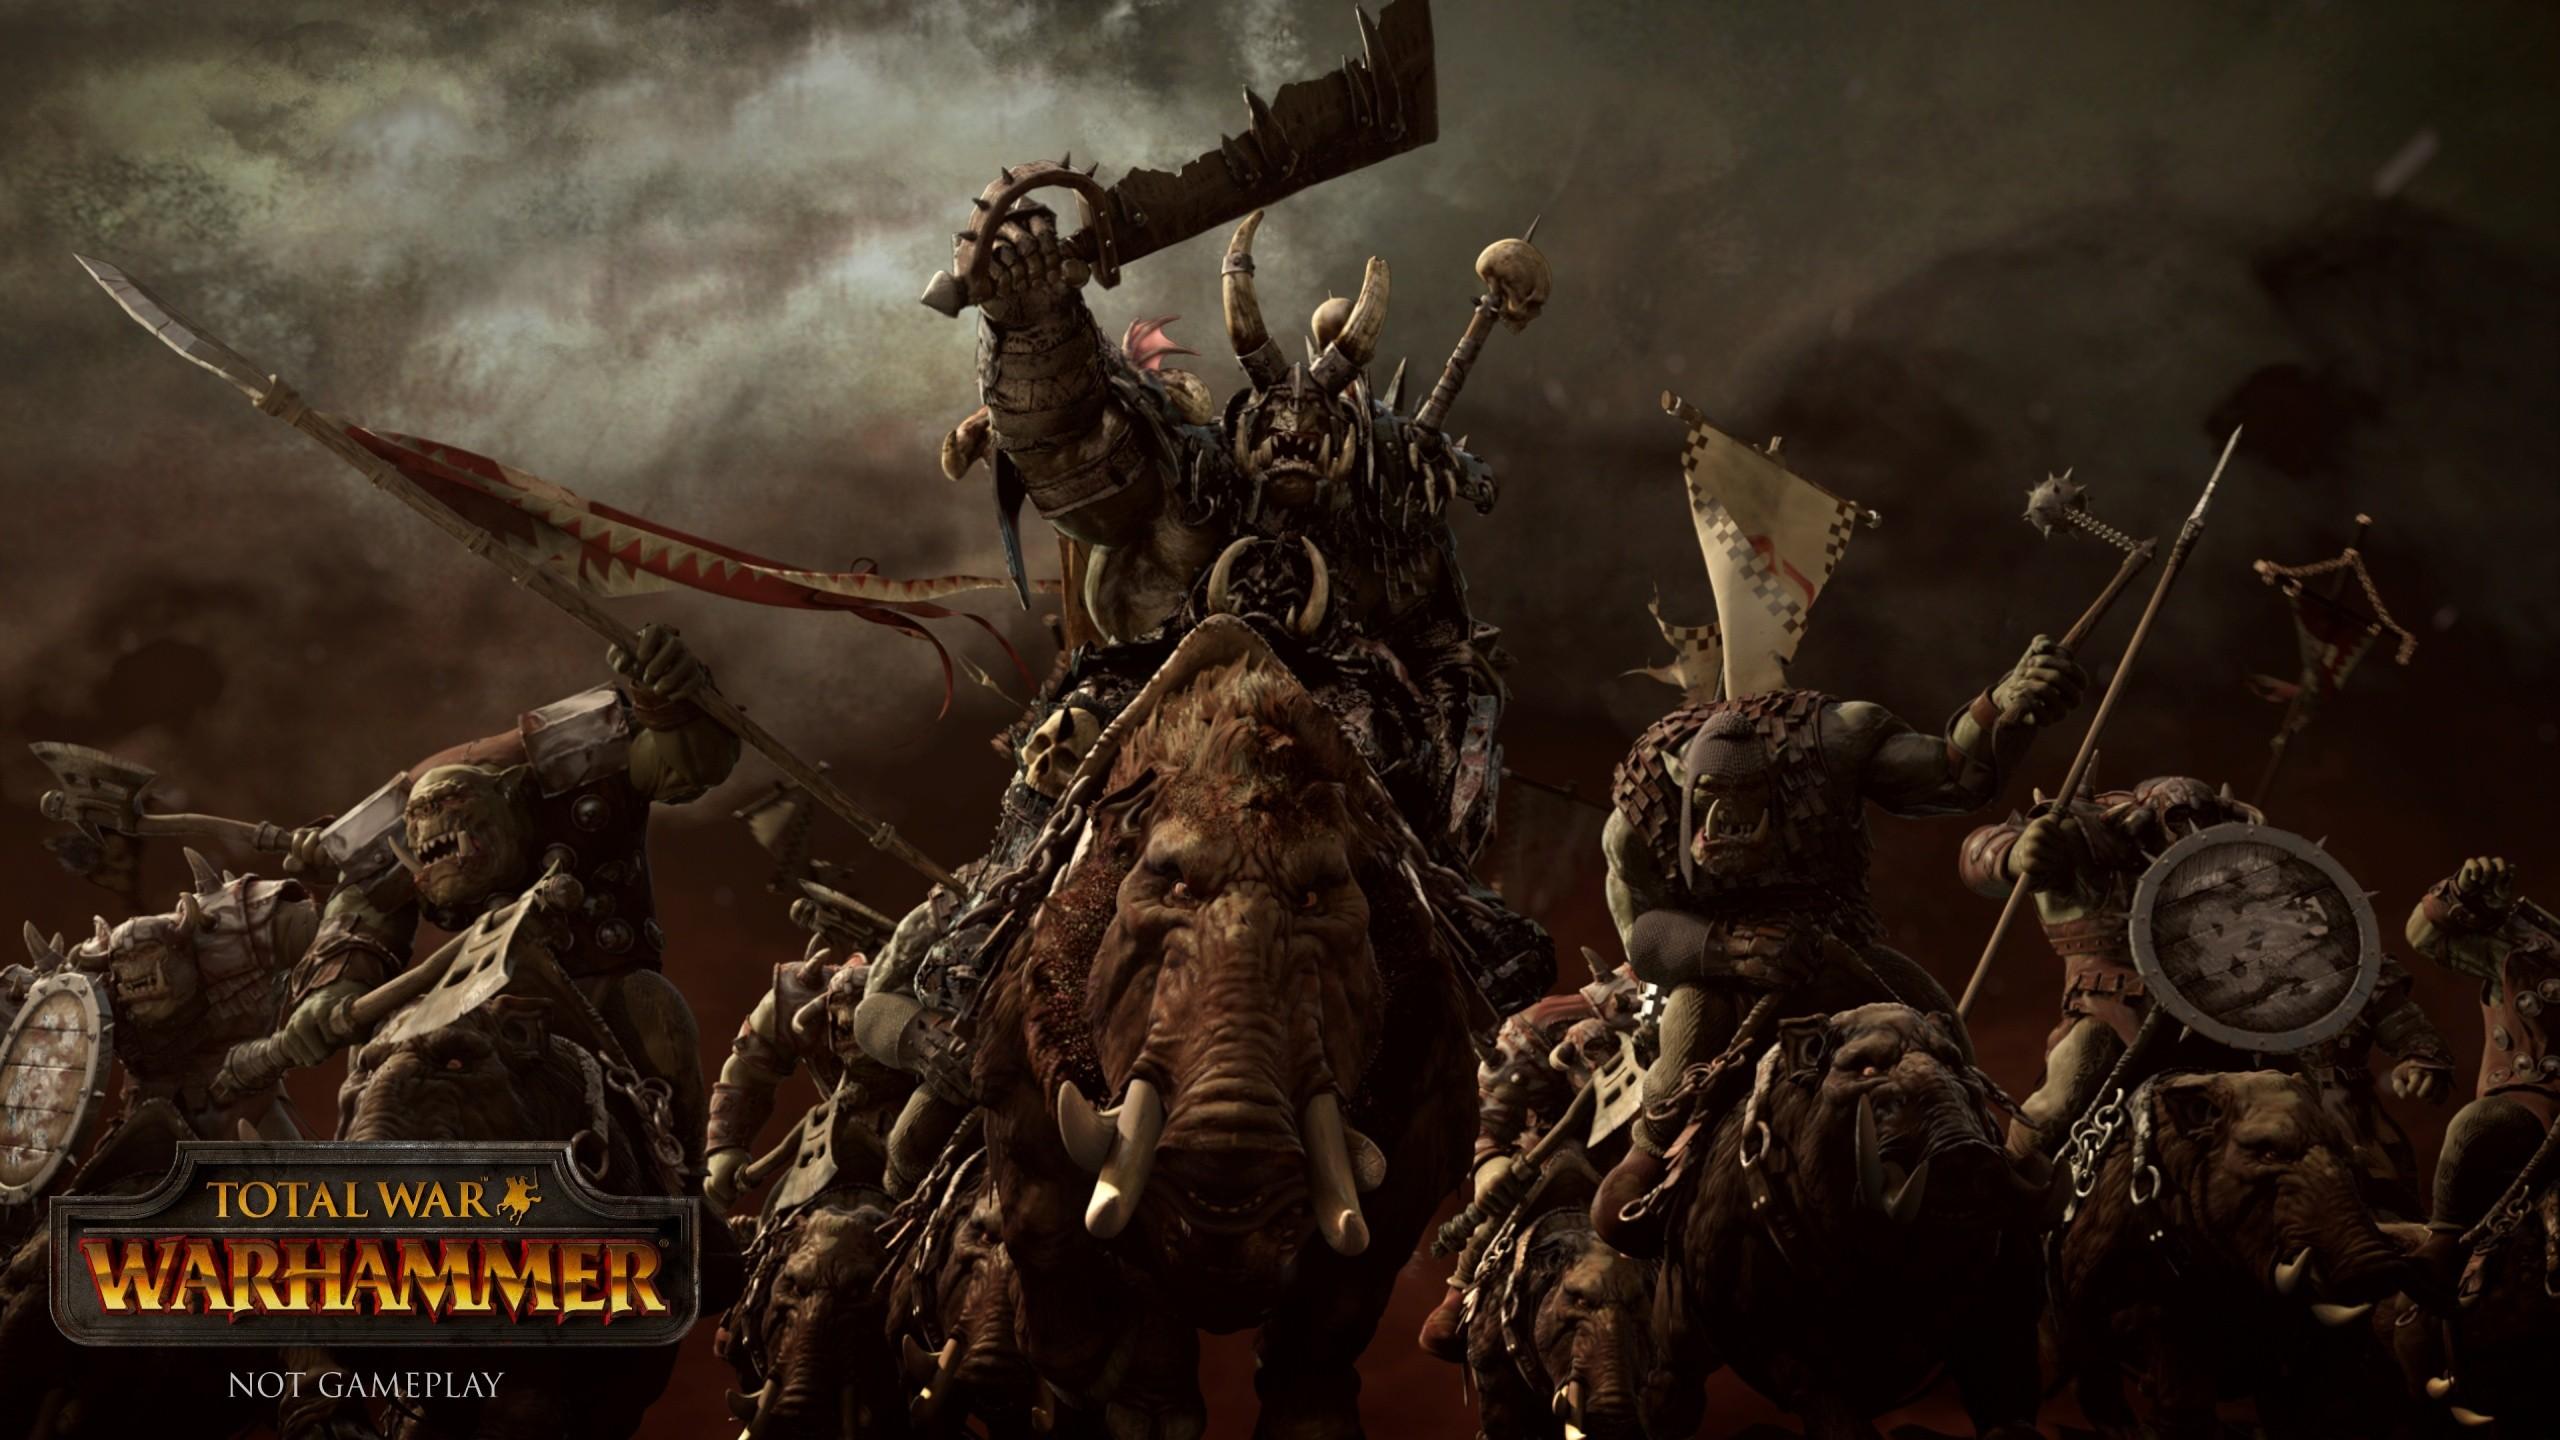 Warhammer Wallpaper Download Free Hd Backgrounds For Desktop